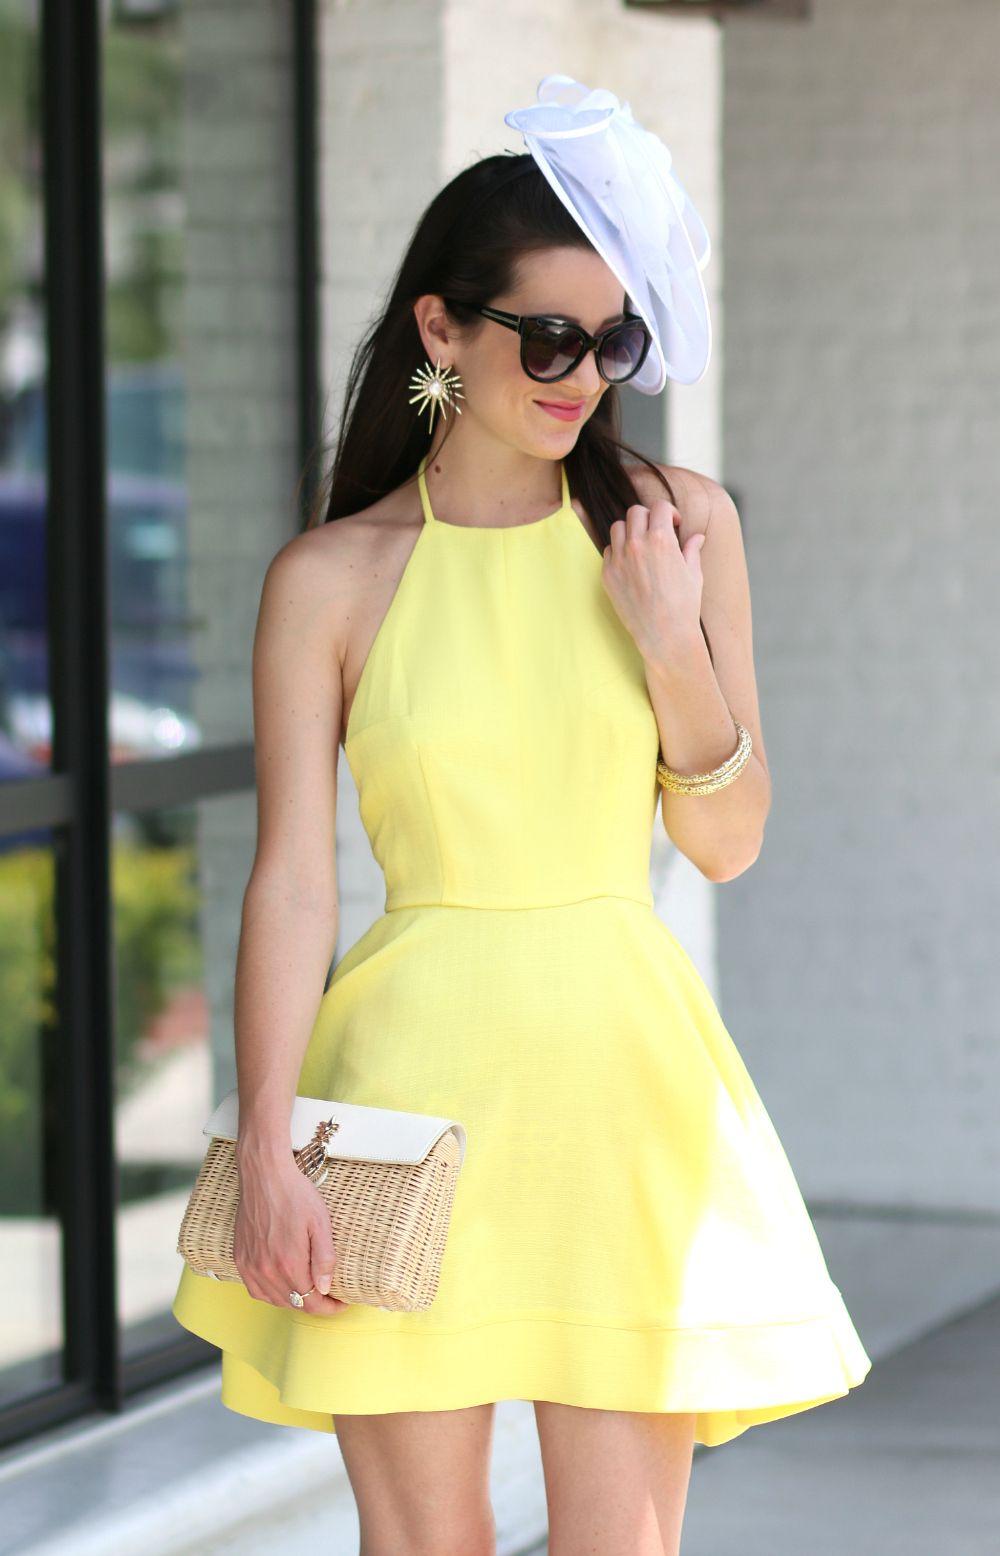 Yellow Derby Dress And White Fascinator Hat Diary Of A Debutante Vestidos Para Senoras Moda De Ropa Ropa [ 1556 x 1000 Pixel ]